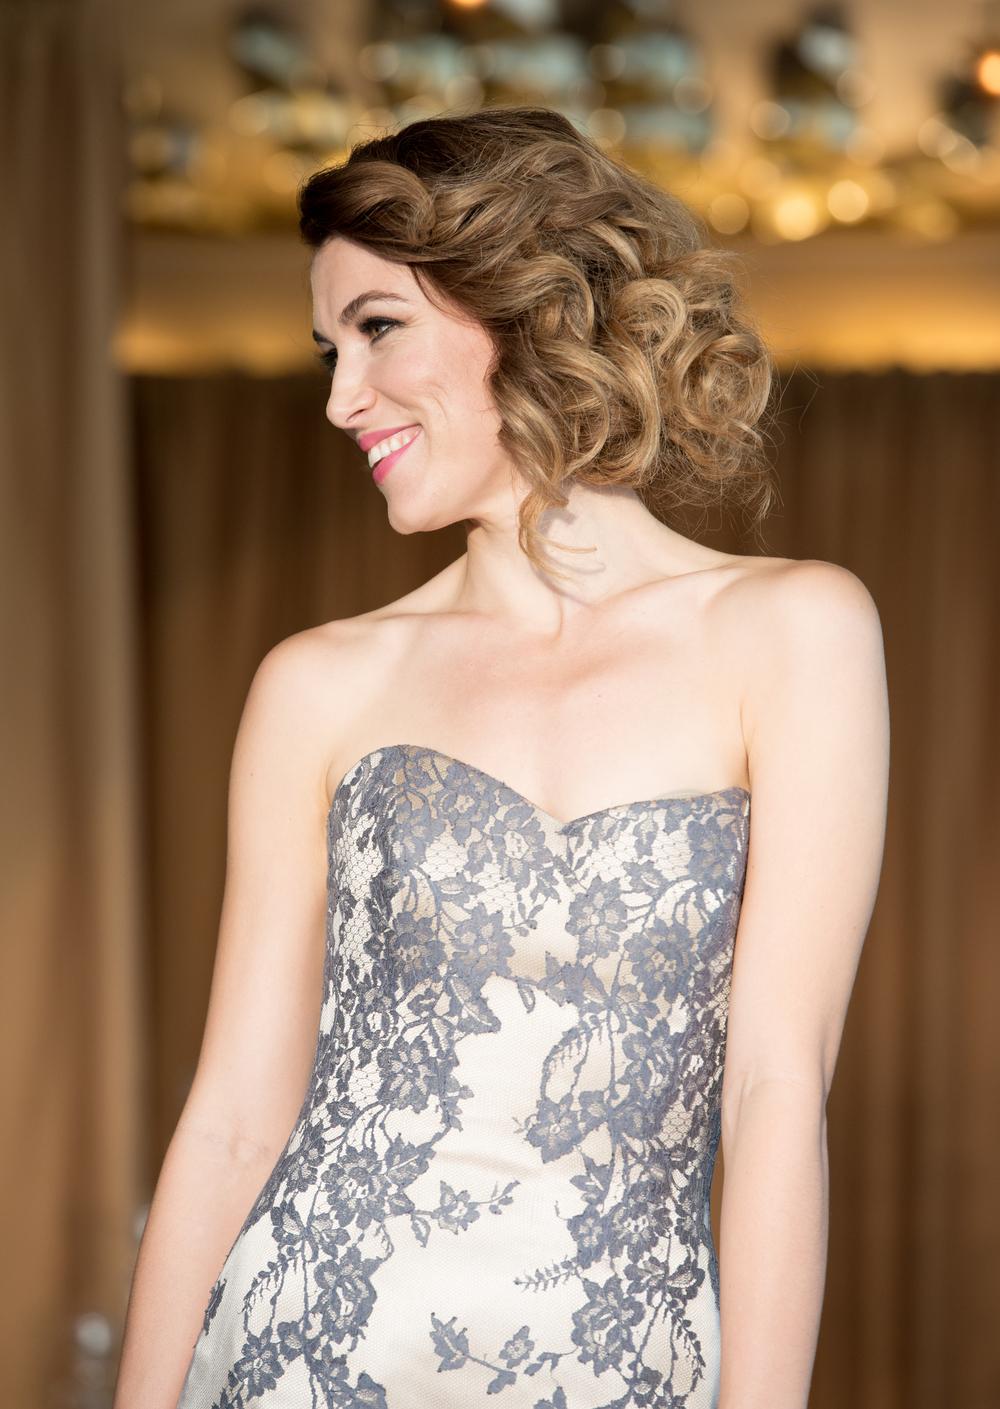 Model: Athena Bergen //  Hair: Samantha Clark | Umbrella Salon //  Make-Up: Jennifer Imbat //   Photography:  Khiem Hoang